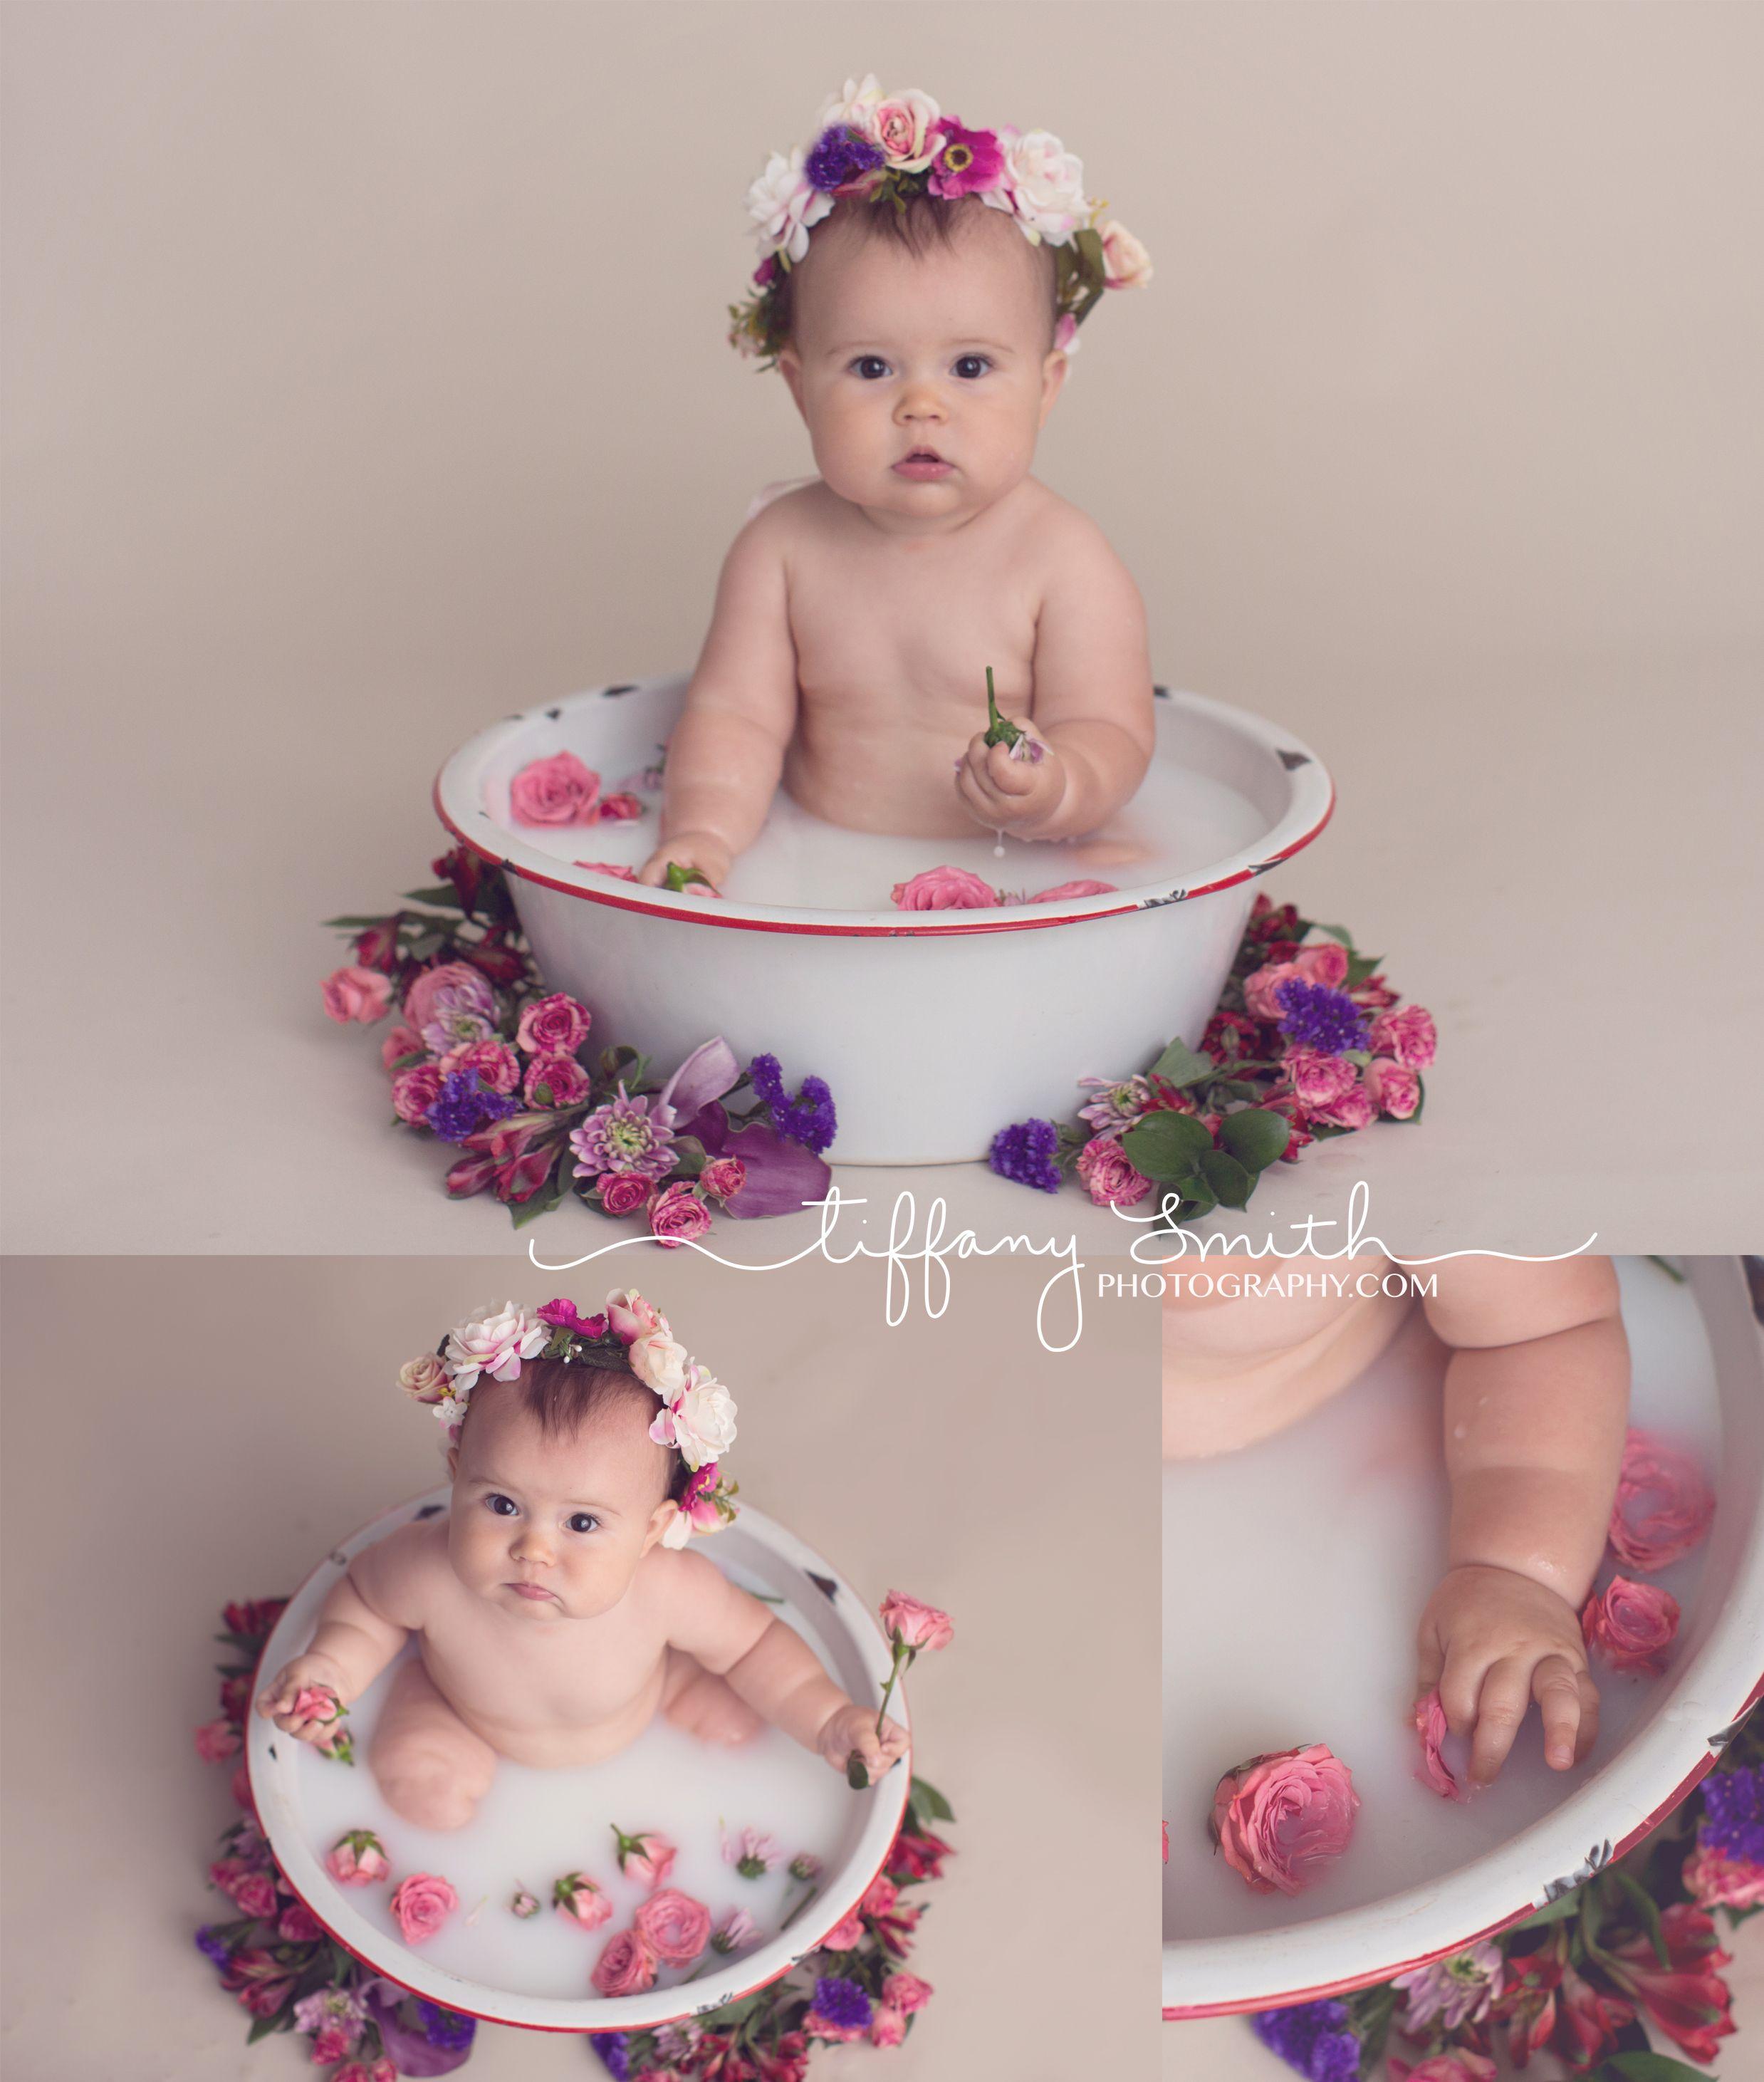 baby milk bath session | milk bath photos with flowers ...